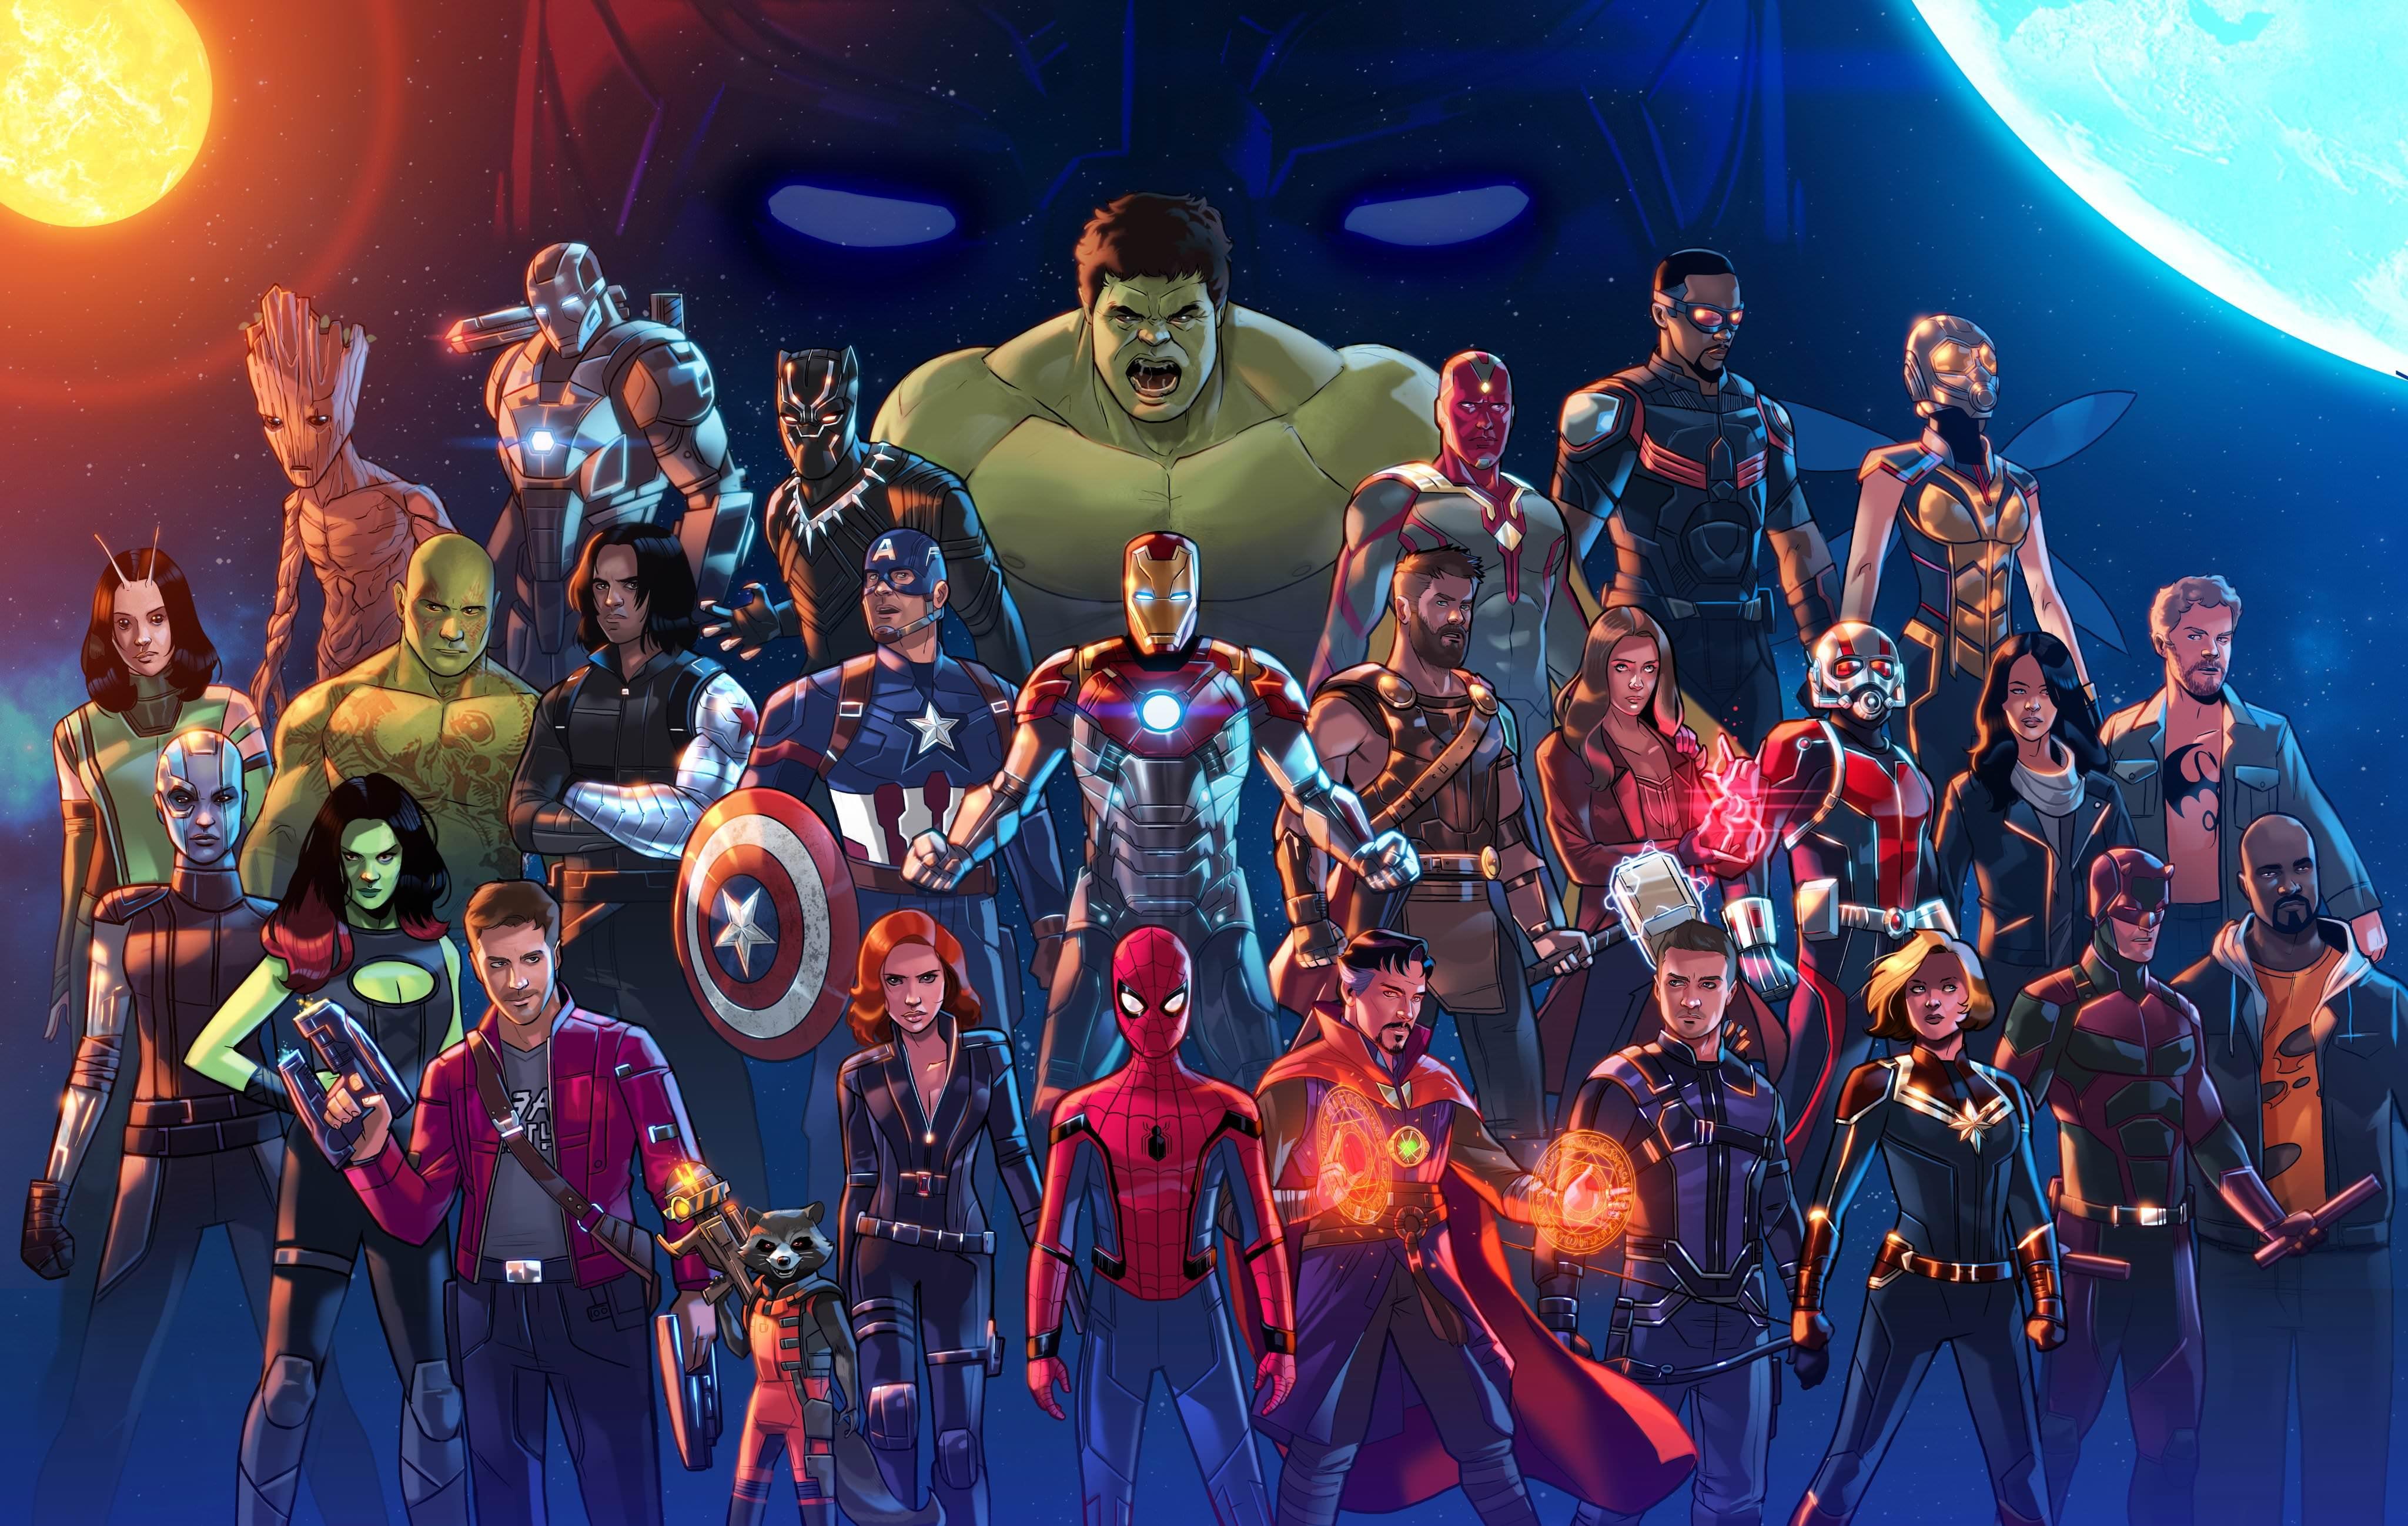 Marvel cinematic universe artwork5k hd superheroes 4k wallpapers images backgrounds photos - Marvel hd wallpapers 4k ...